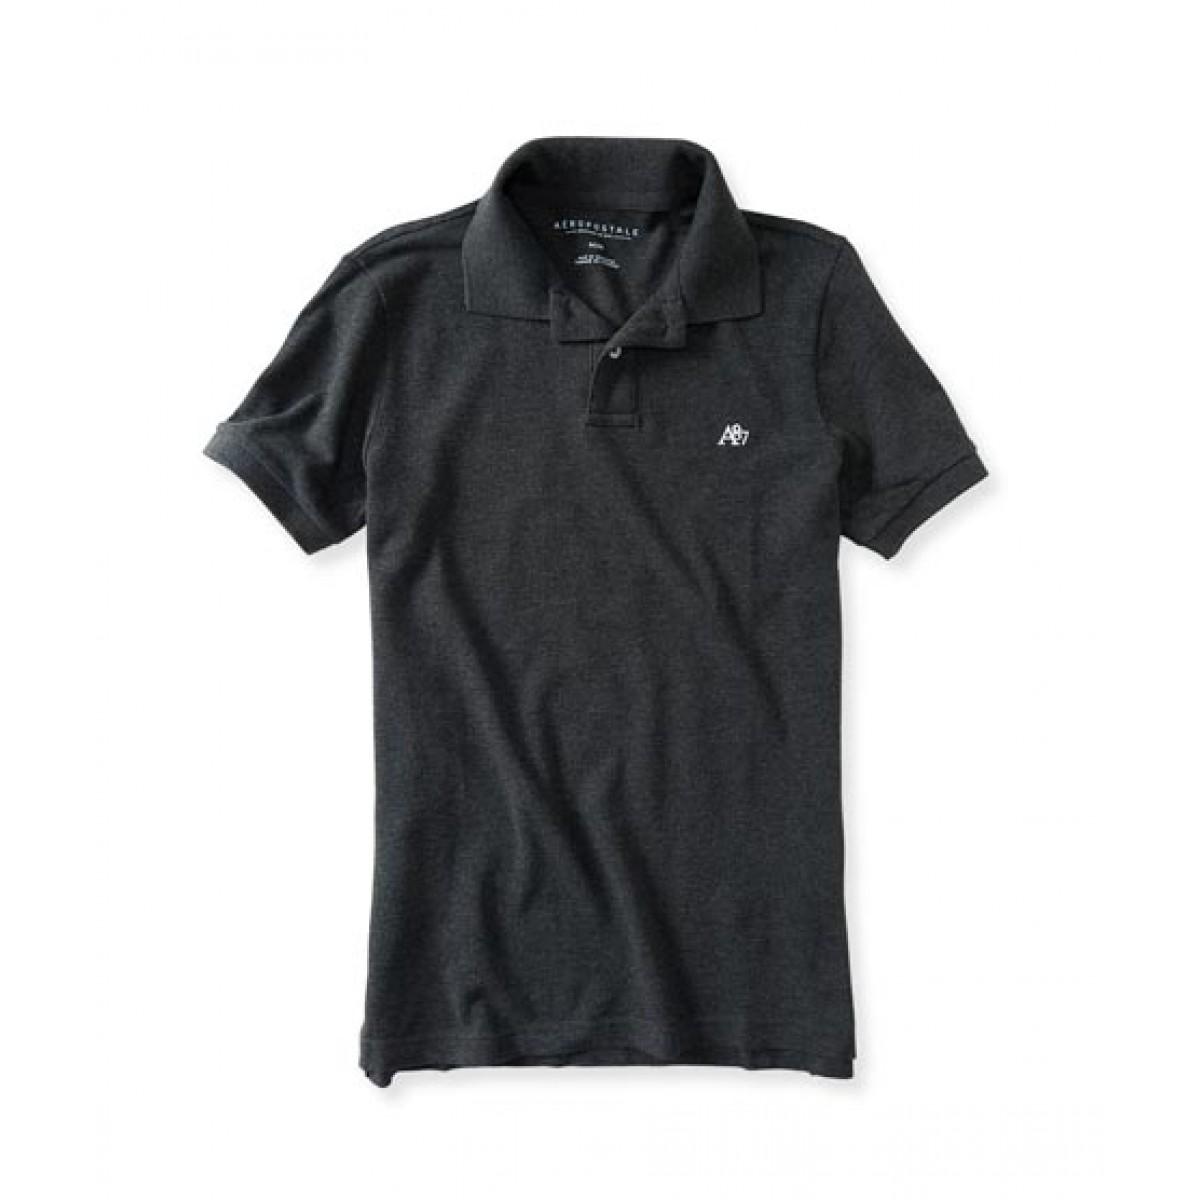 7462db8217b Aeropostale Polo shirt Price in Pakistan | Buy Aeropostale A87 Solid Logo  Pique Polo shirt-Charcoal Heather Grey | iShopping.pk